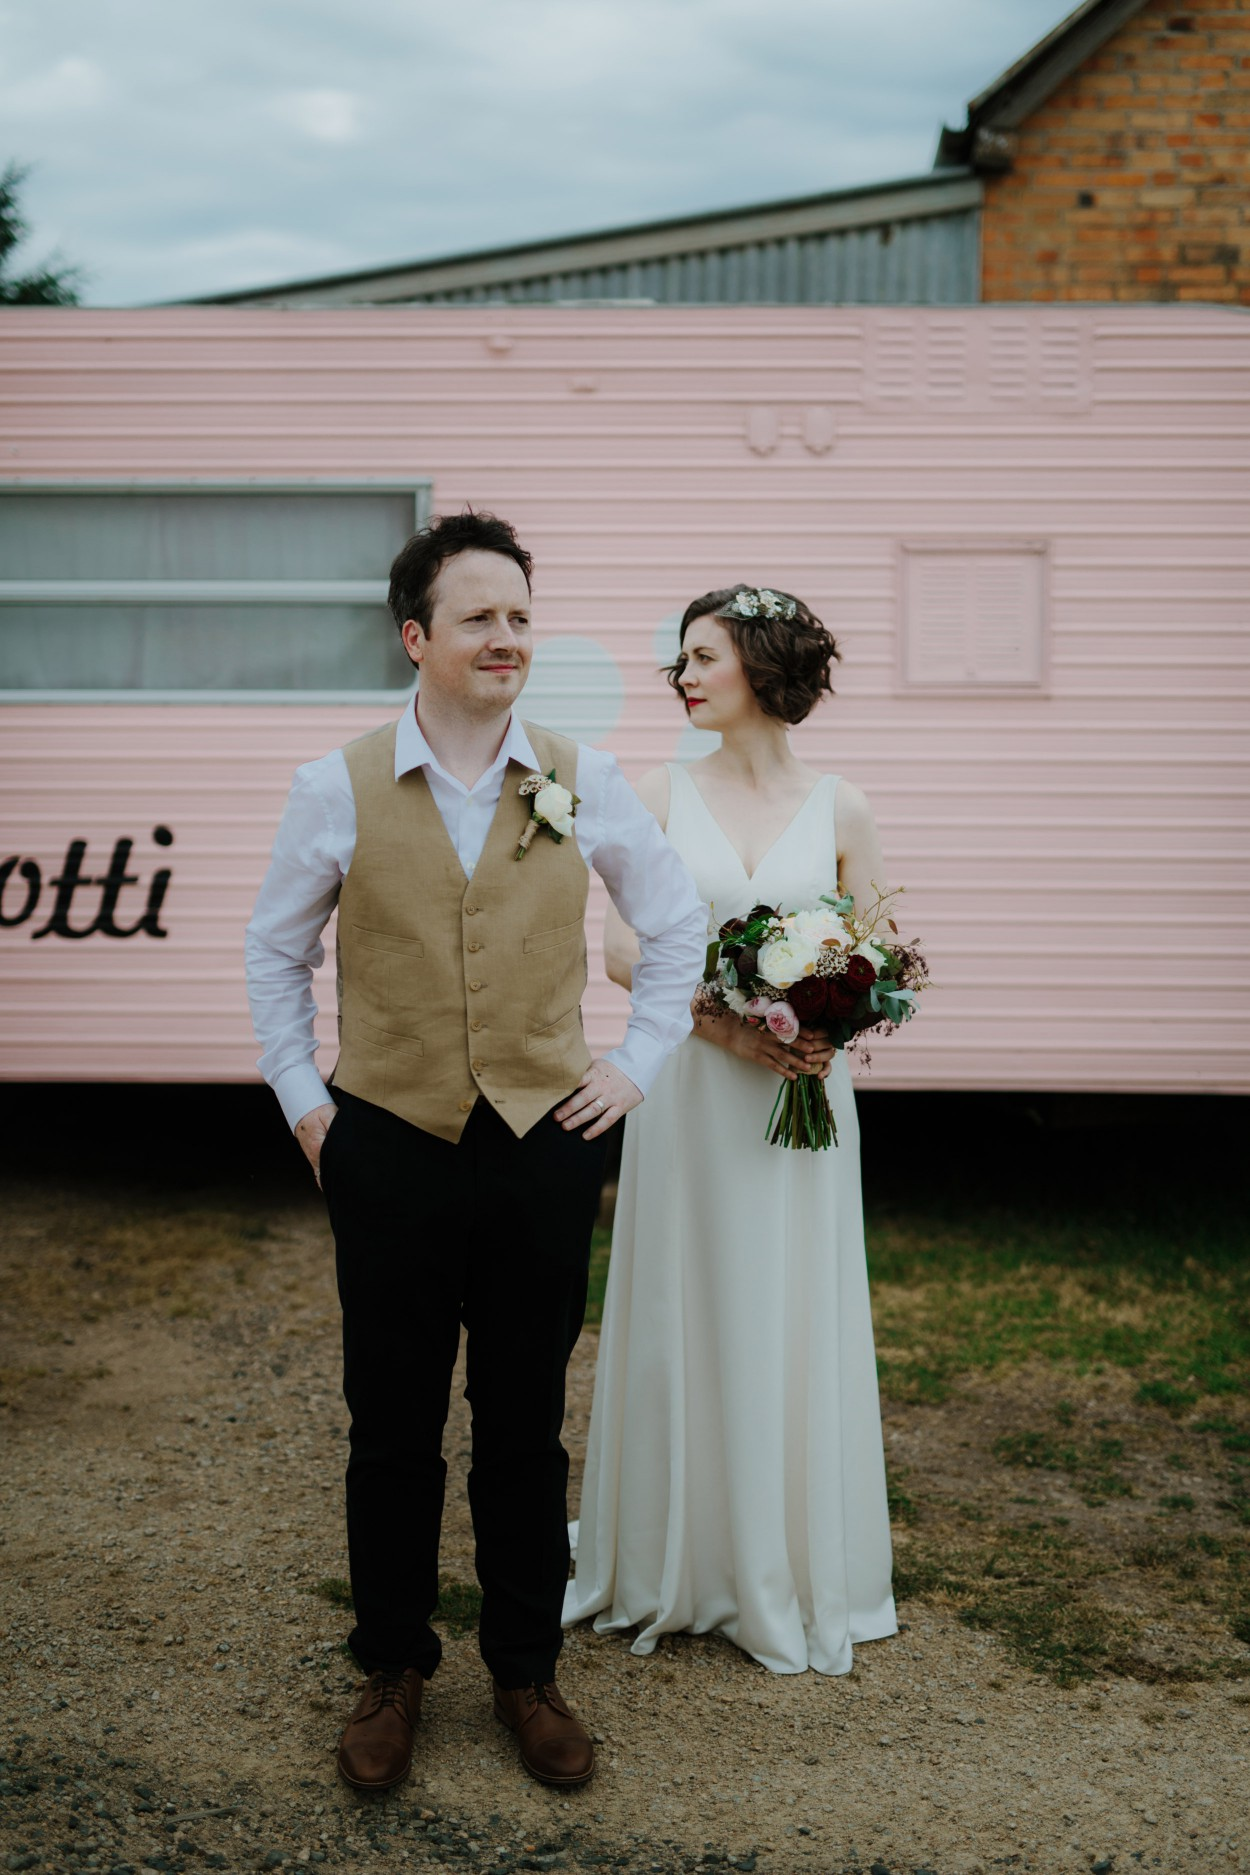 I-Got-You-Babe-&-Co.-Wedding-Photographers-Elsa016.jpg